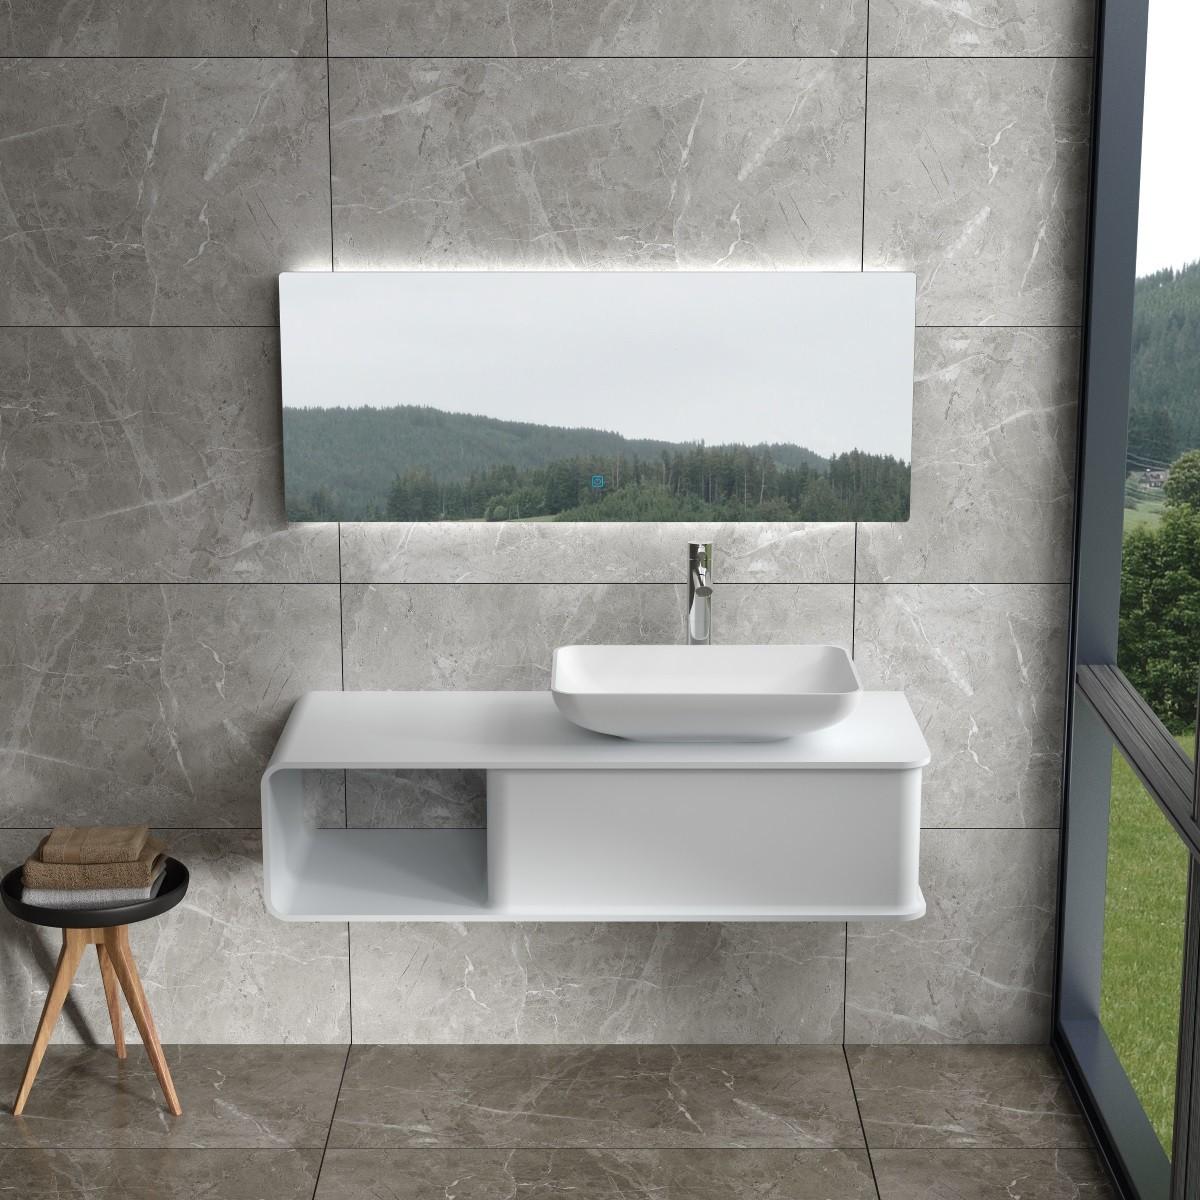 waschtisch vp7 mineralguss badausstattung. Black Bedroom Furniture Sets. Home Design Ideas